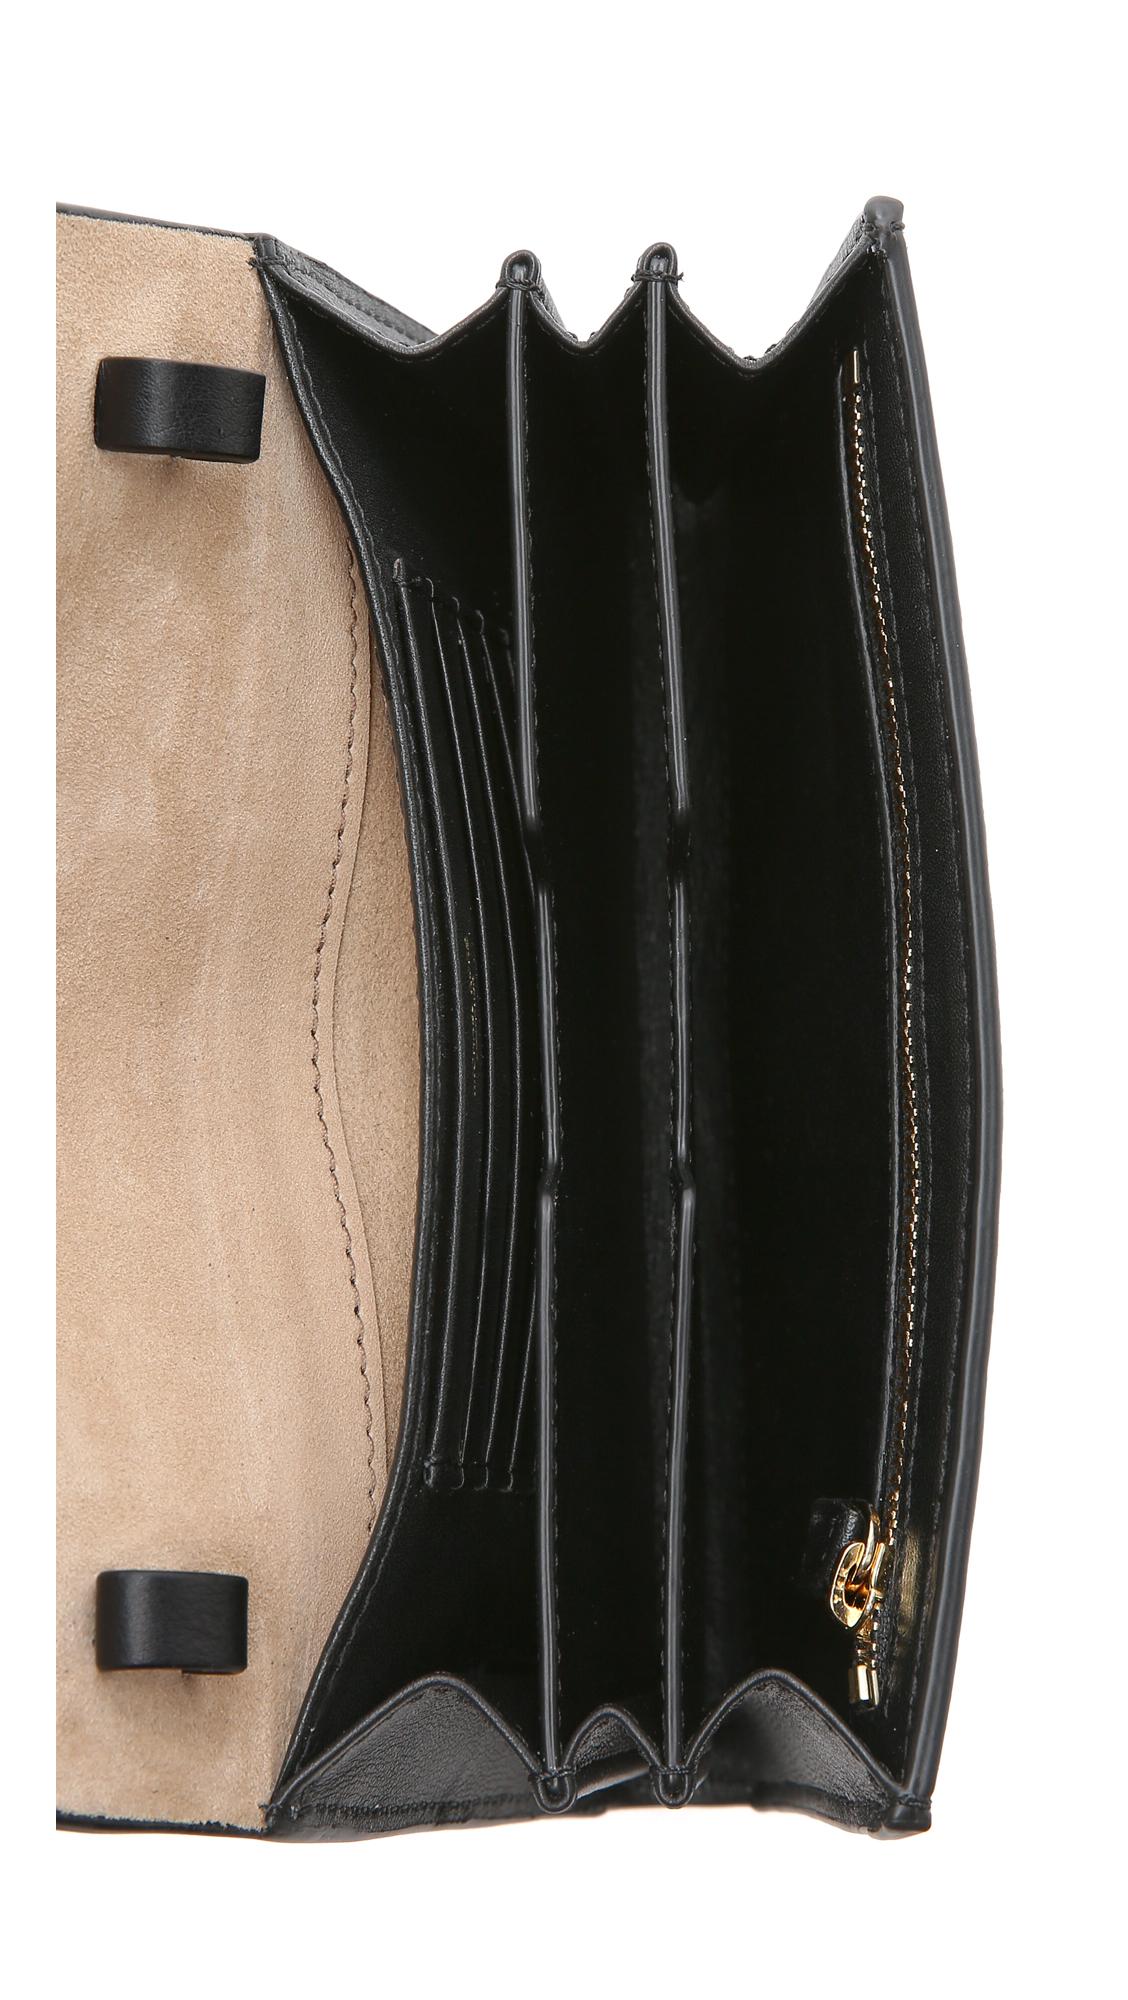 b8bf015a597c Gallery. Previously sold at: Shopbop · Women's Michael By Michael Kors  Miranda Women's Fuchsia Wallets ...